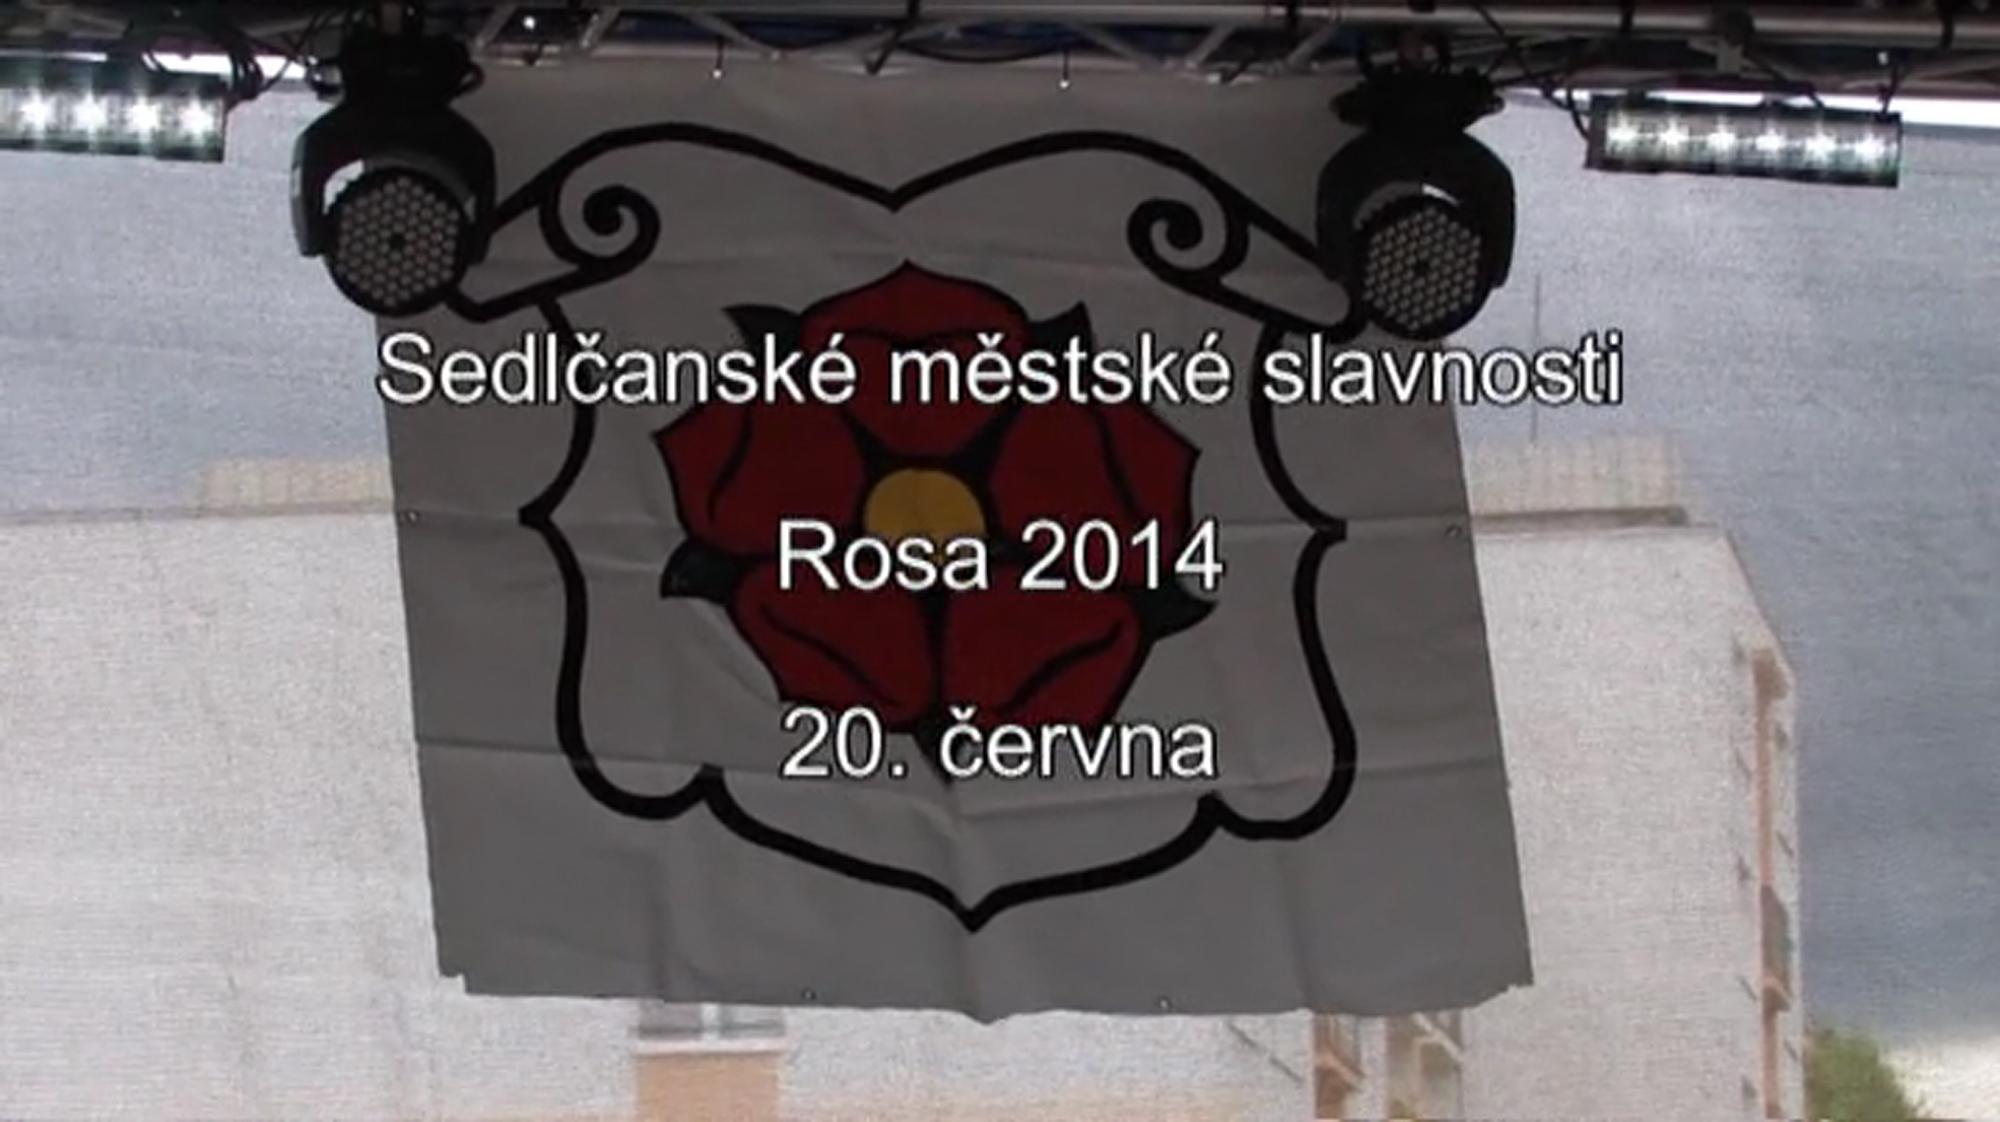 rosa 2014